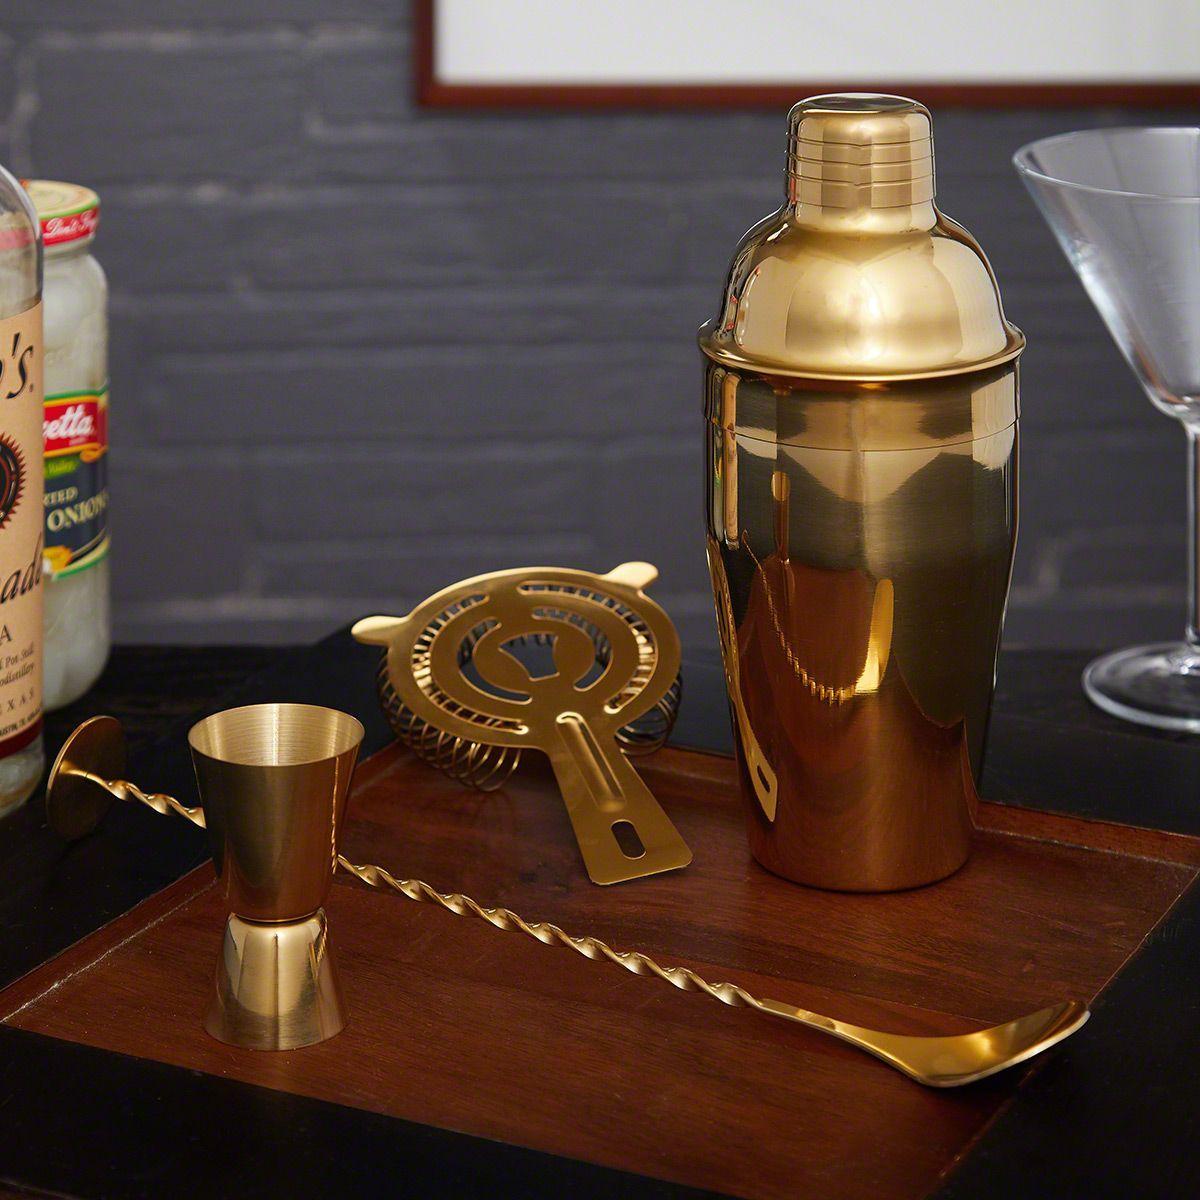 Ridgemont Gold Bar Tool Set And Cocktail Shaker Engravable In 2020 Bar Tool Set Bar Tools Cocktail Shaker